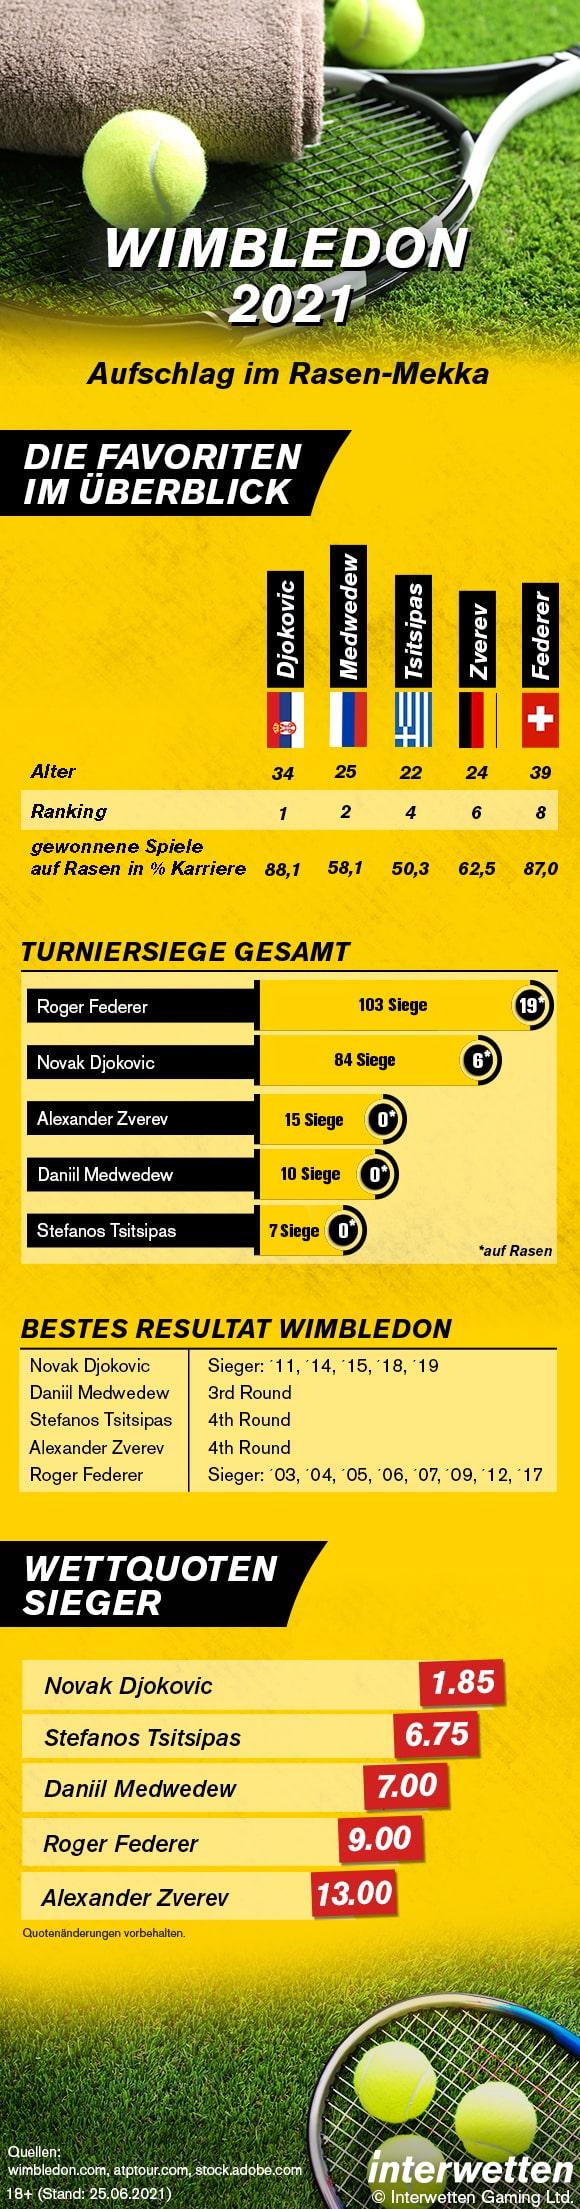 Infografik Wimbledon 2021